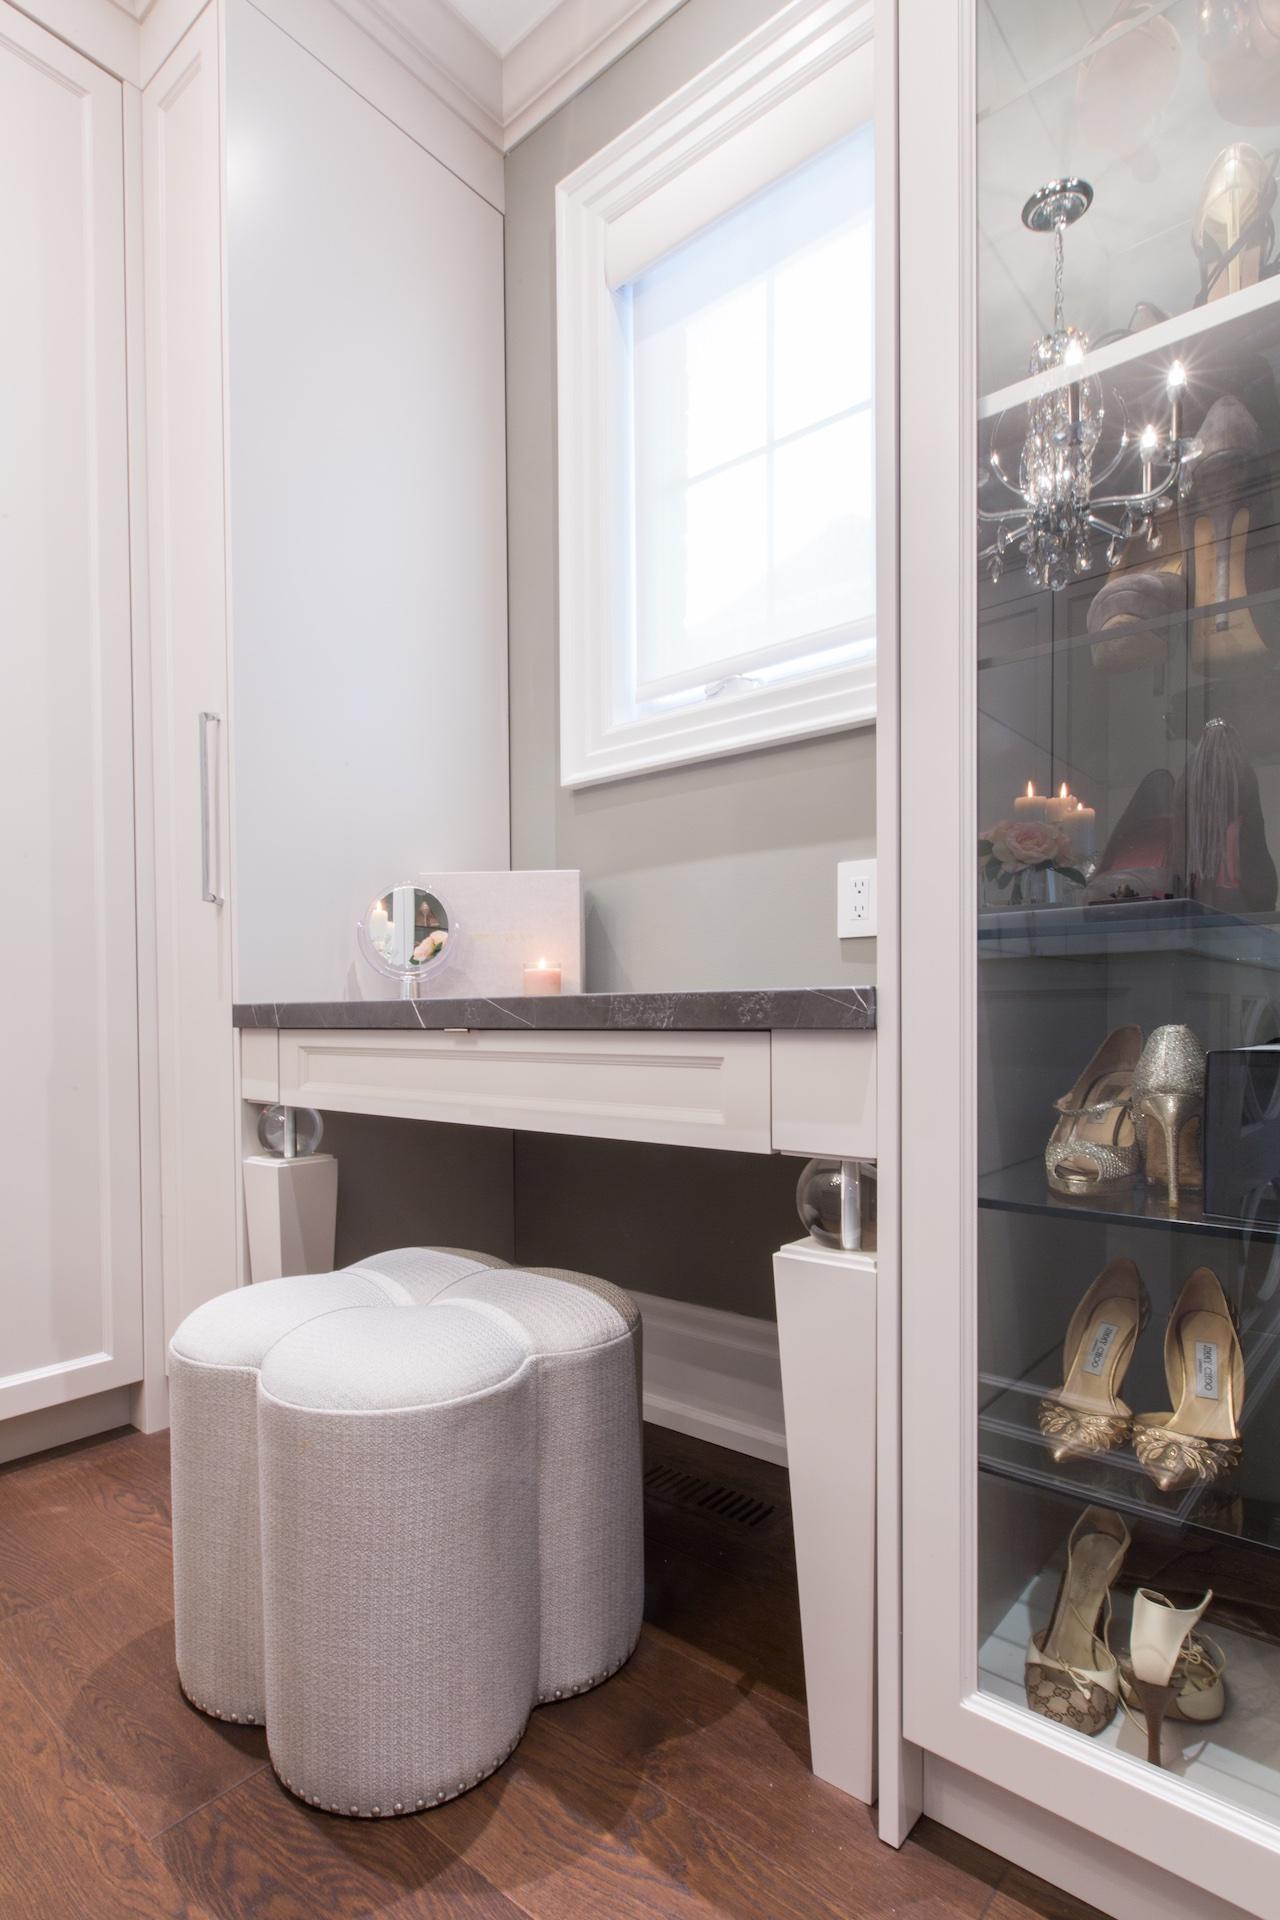 Wardrobe desk with stool